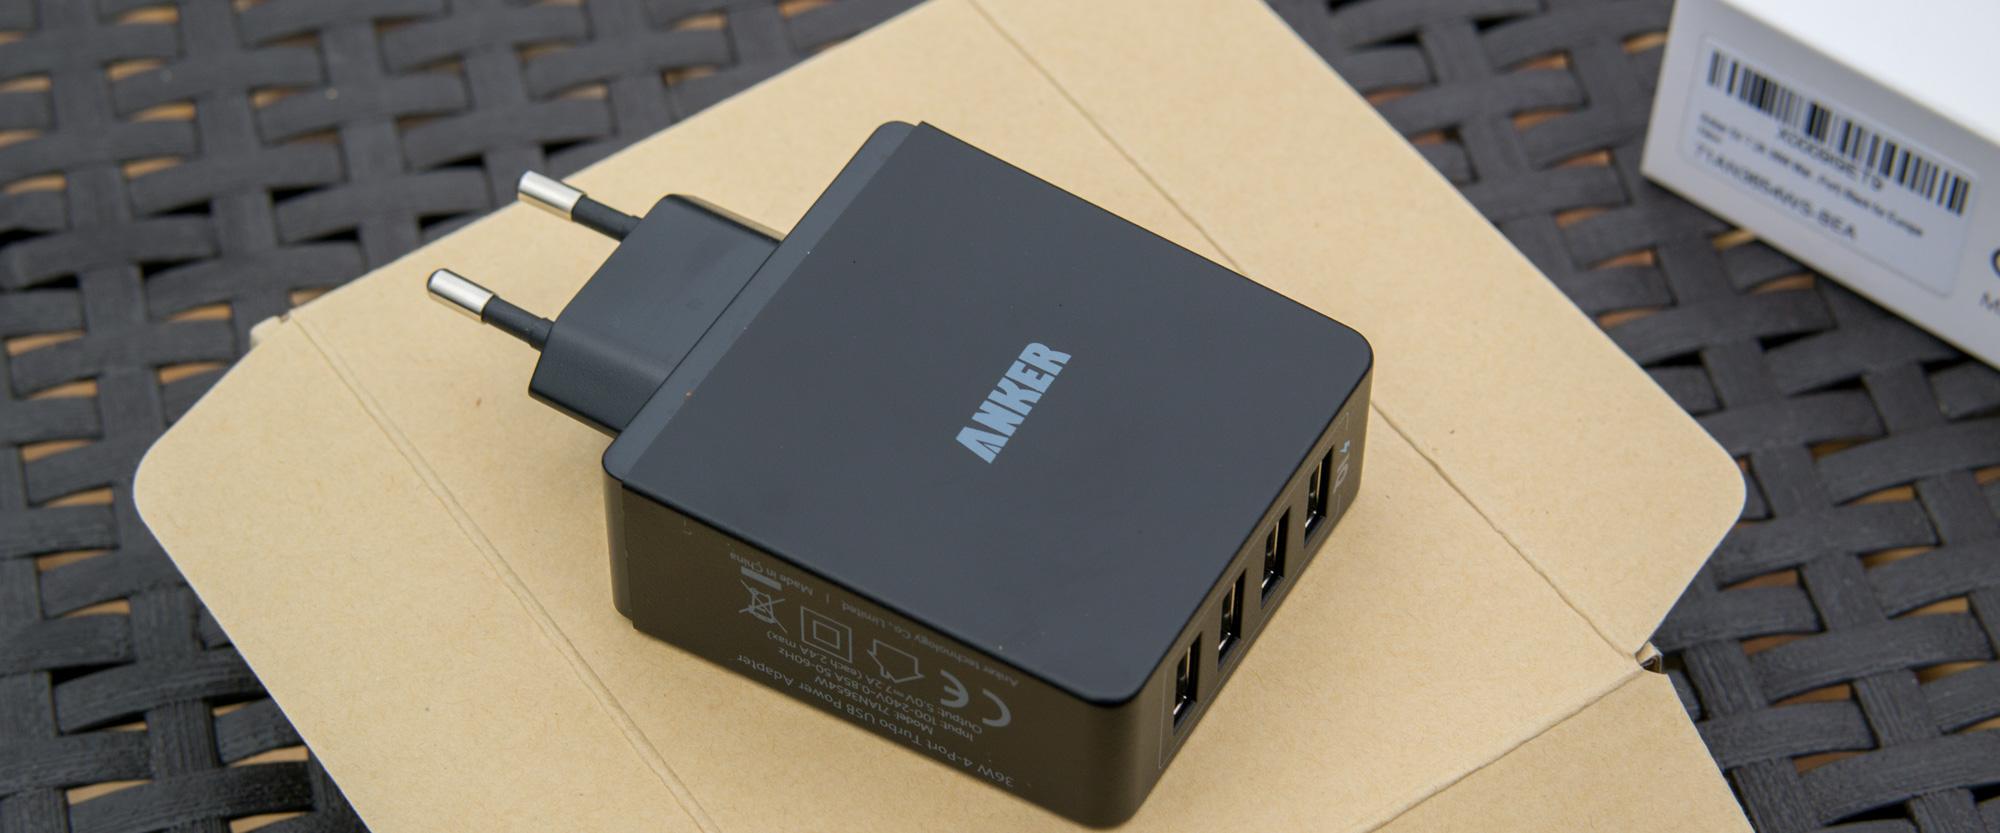 [Review] Anker 36W 5V / 7.2A 4-Port USB Ladegerät